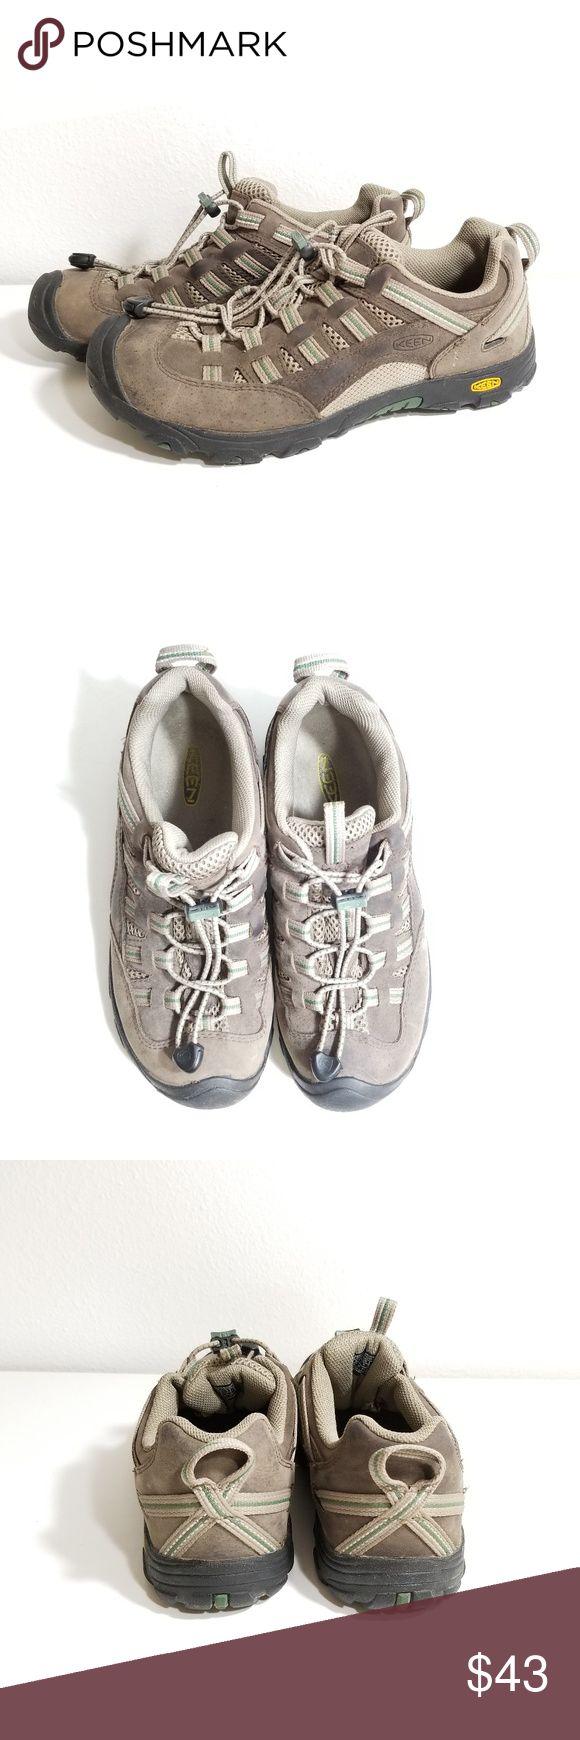 Best deals Women s Trainers Women Victoria DEPORTIVO BASKET PIEL White SilverGood support shoe